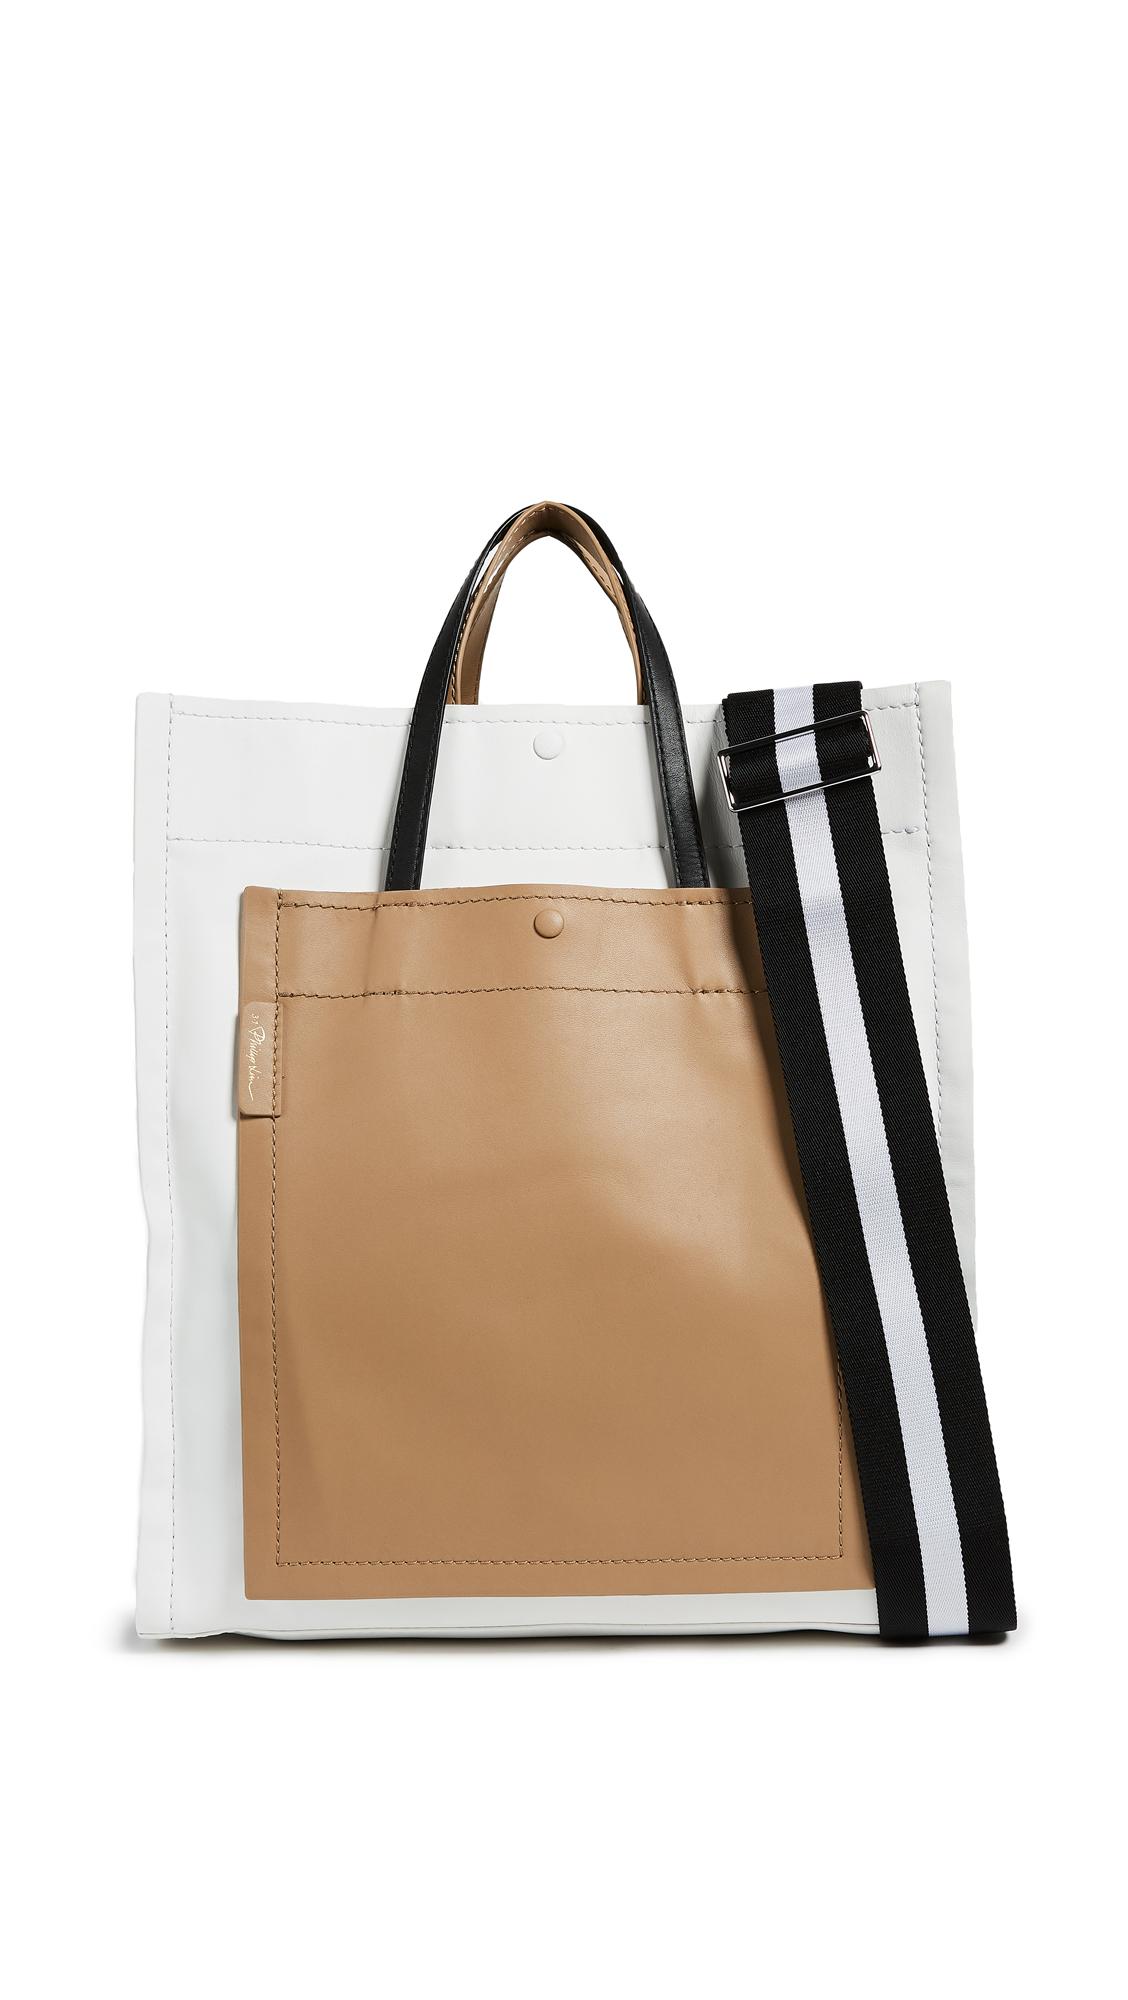 3.1 Phillip Lim Accordion Shopper - Natural